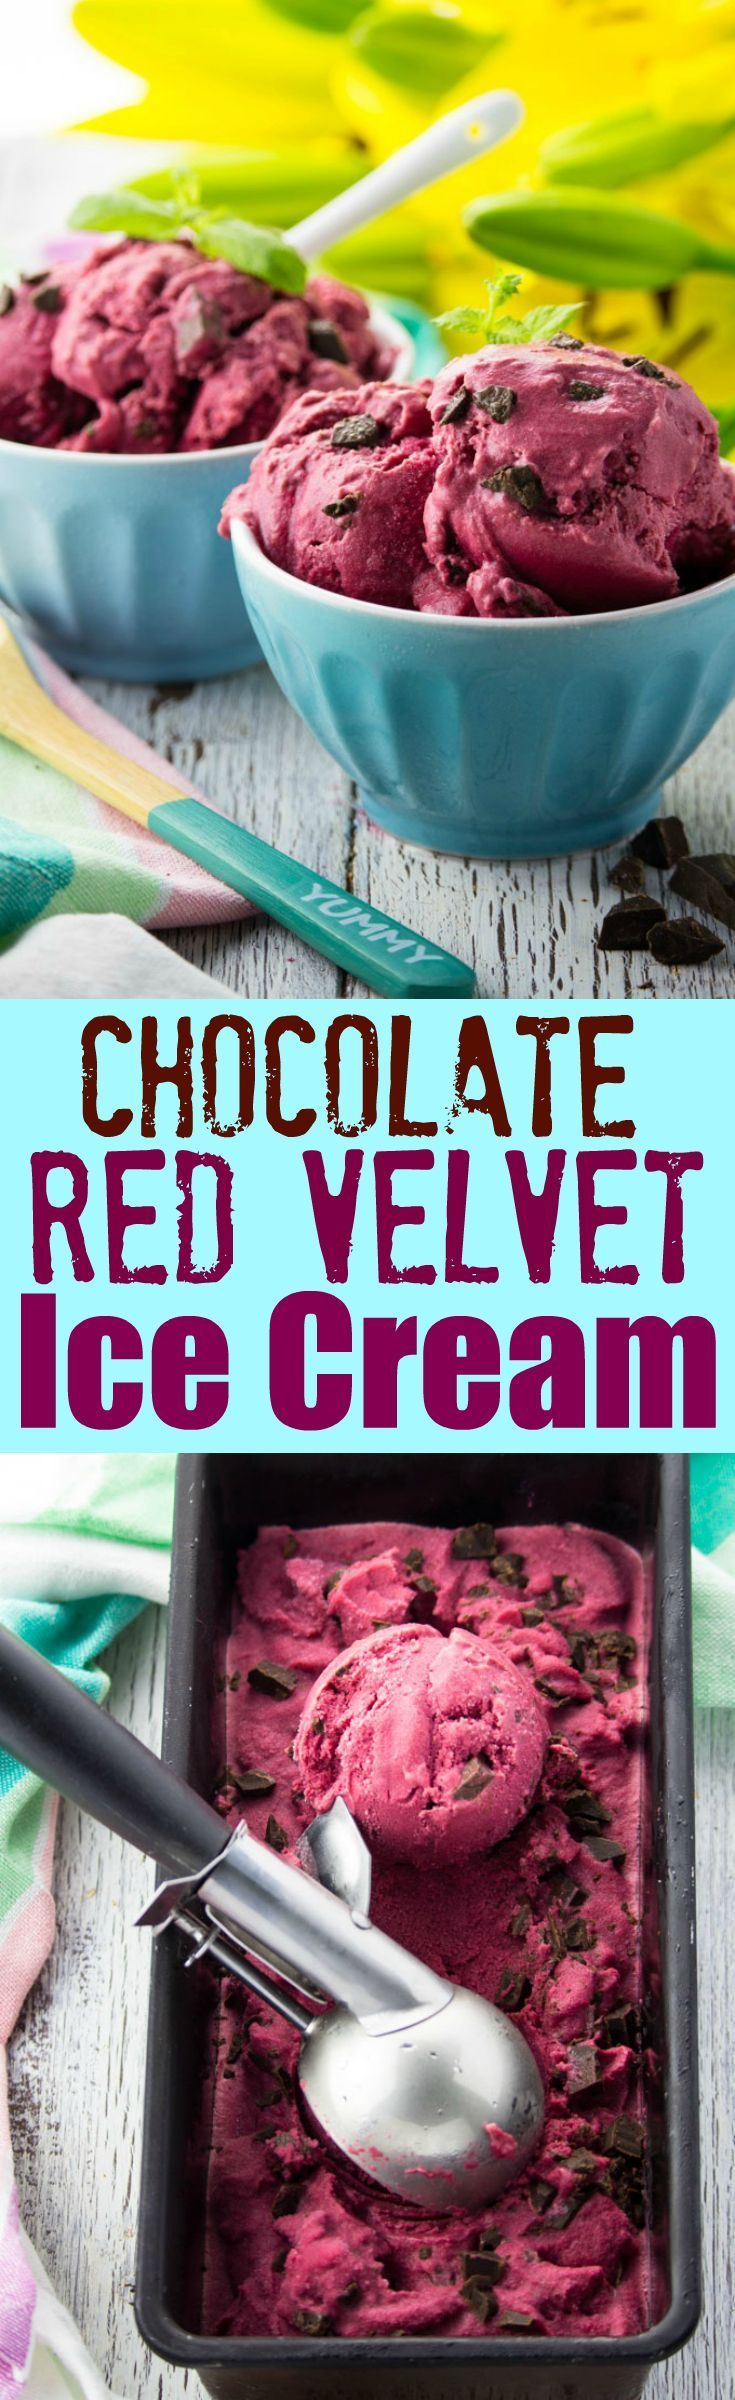 Chocolate Chunk Beet Ice Cream